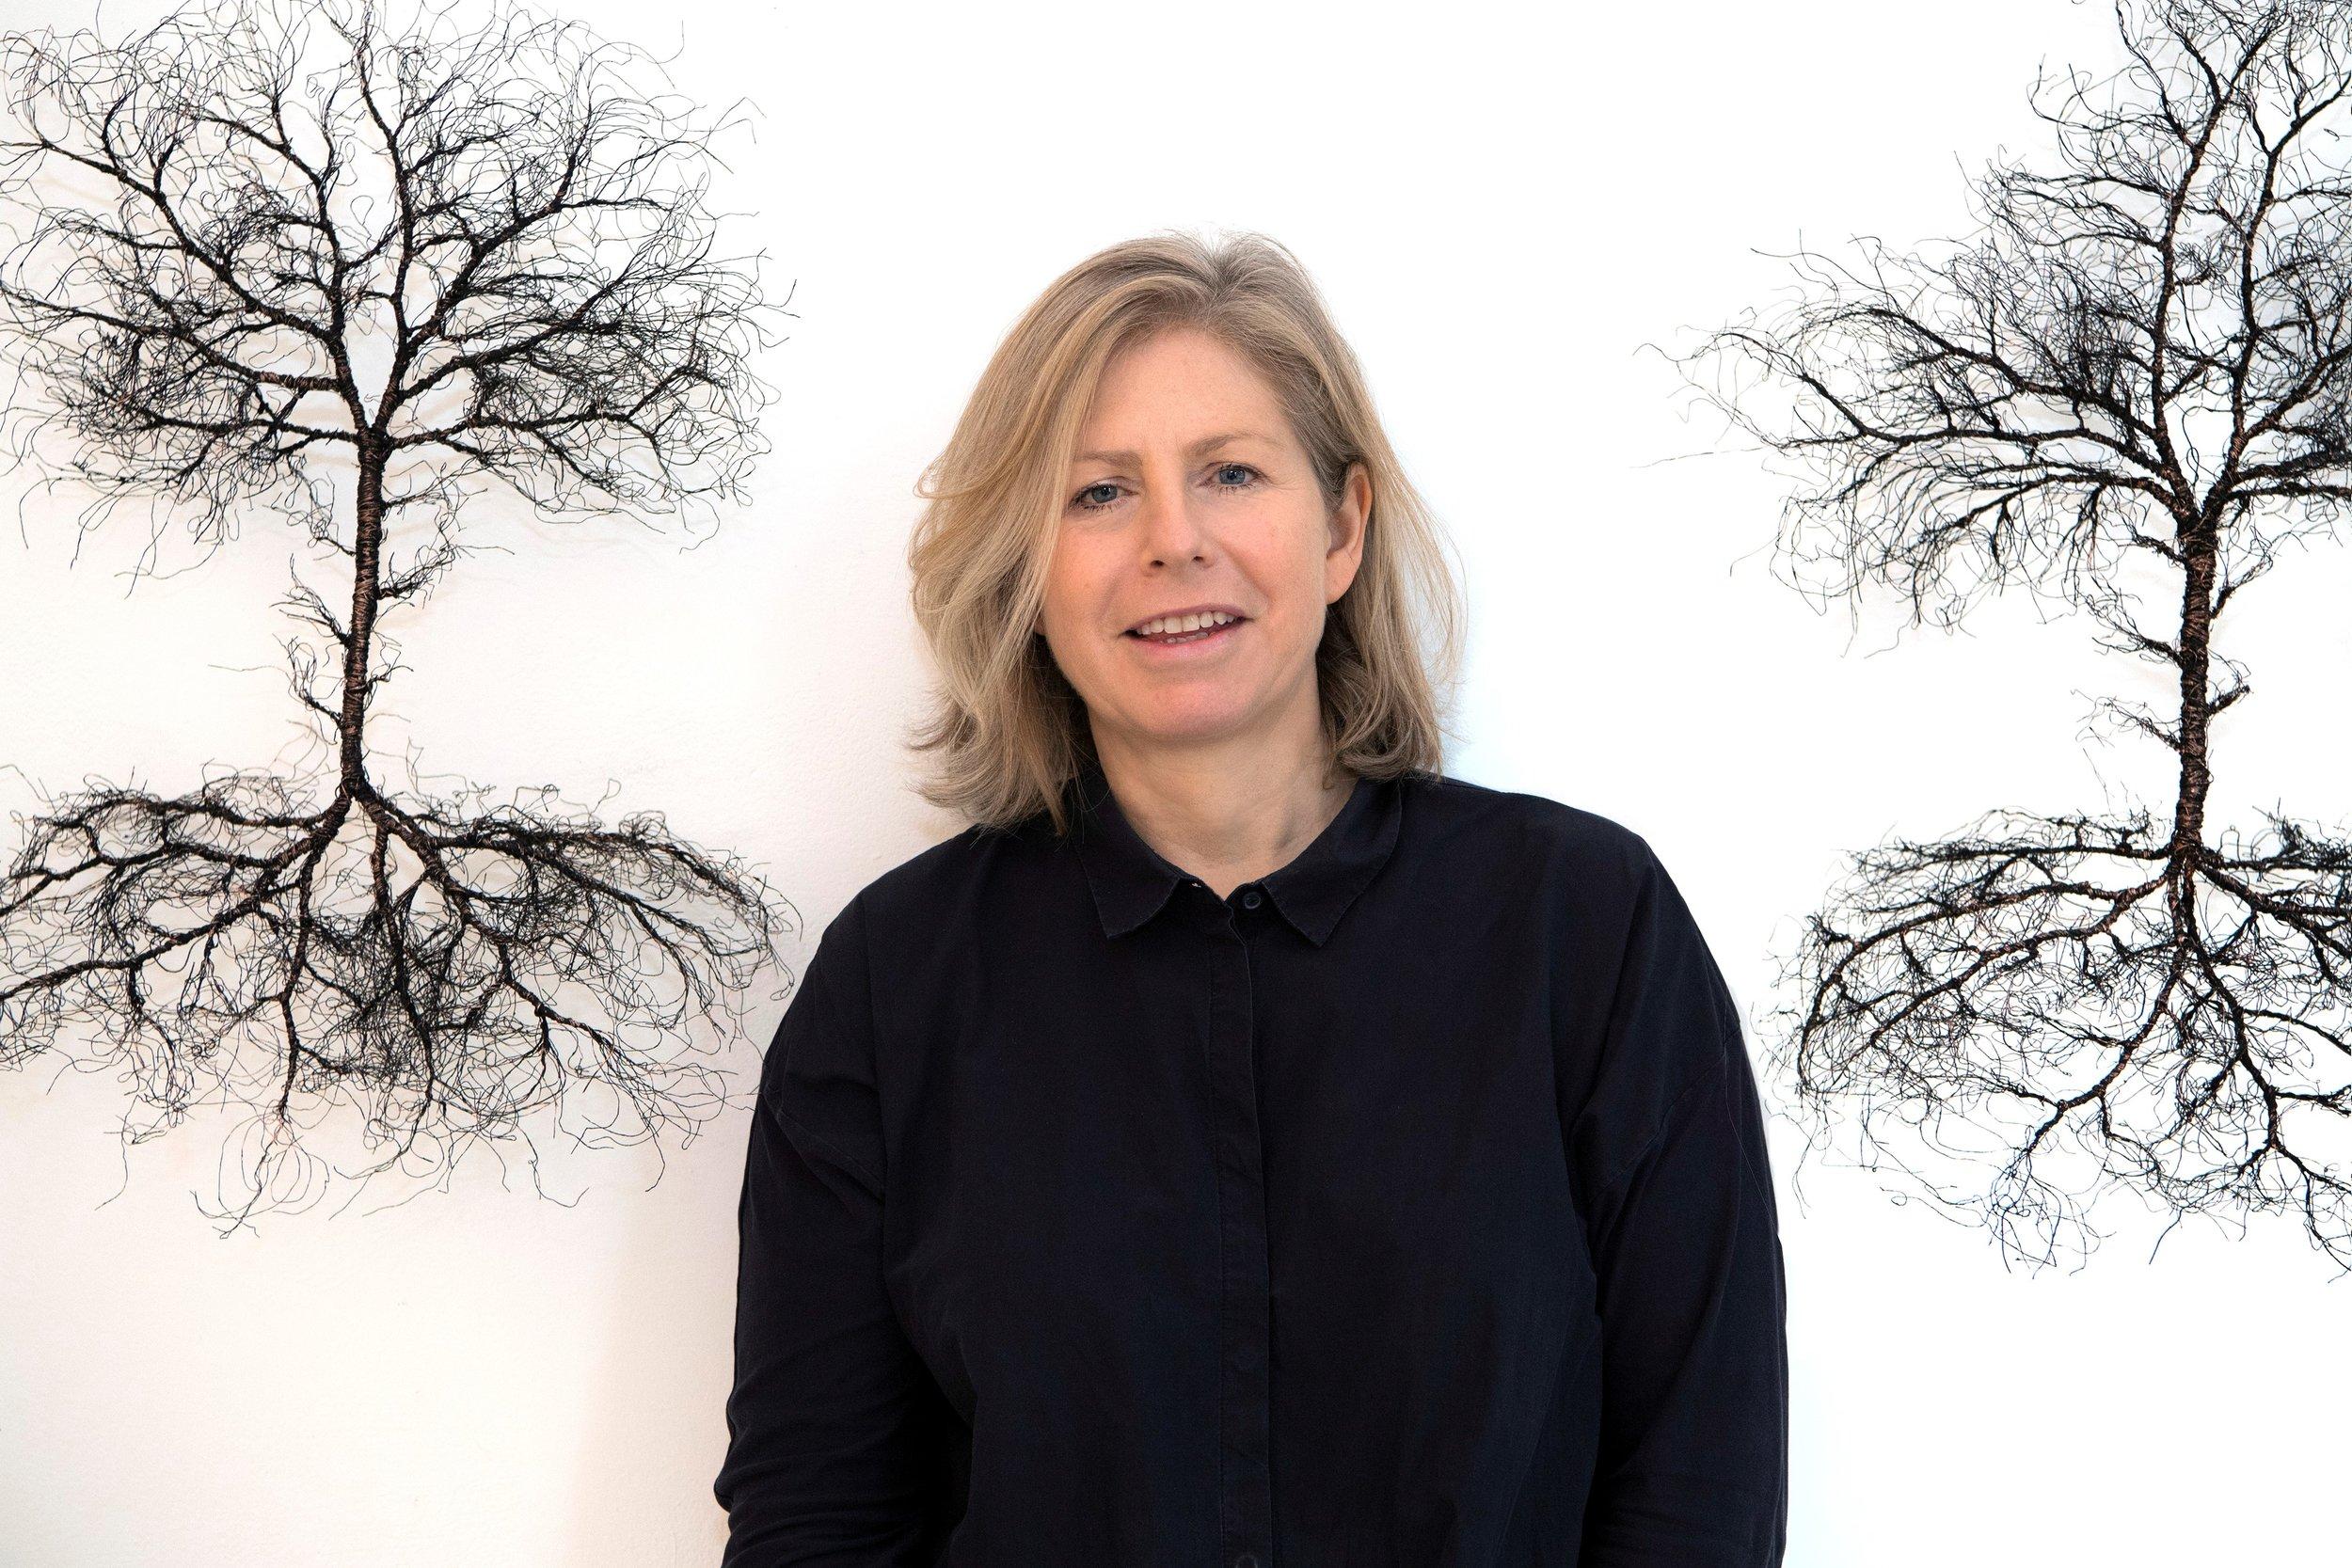 Cathy de Monchaux. Photo © Richard Hubert Smith, 2016.